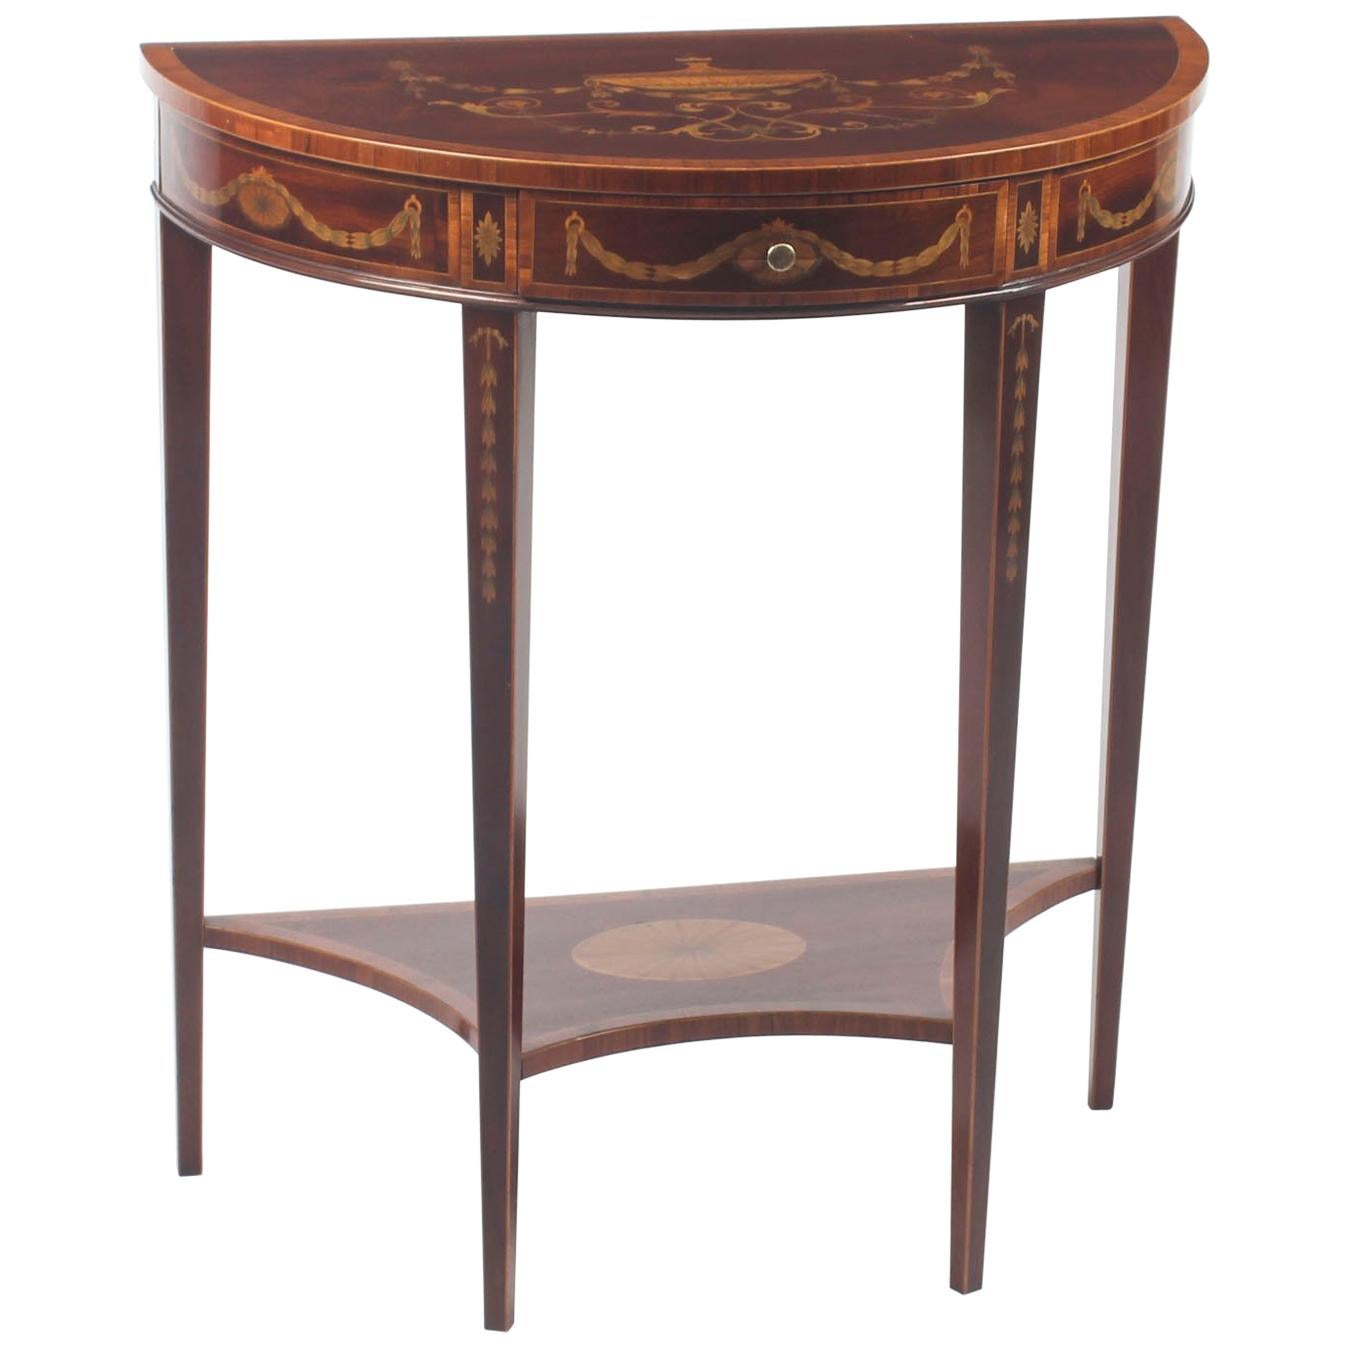 Exceptionnel Antique Console Tables 19th Century